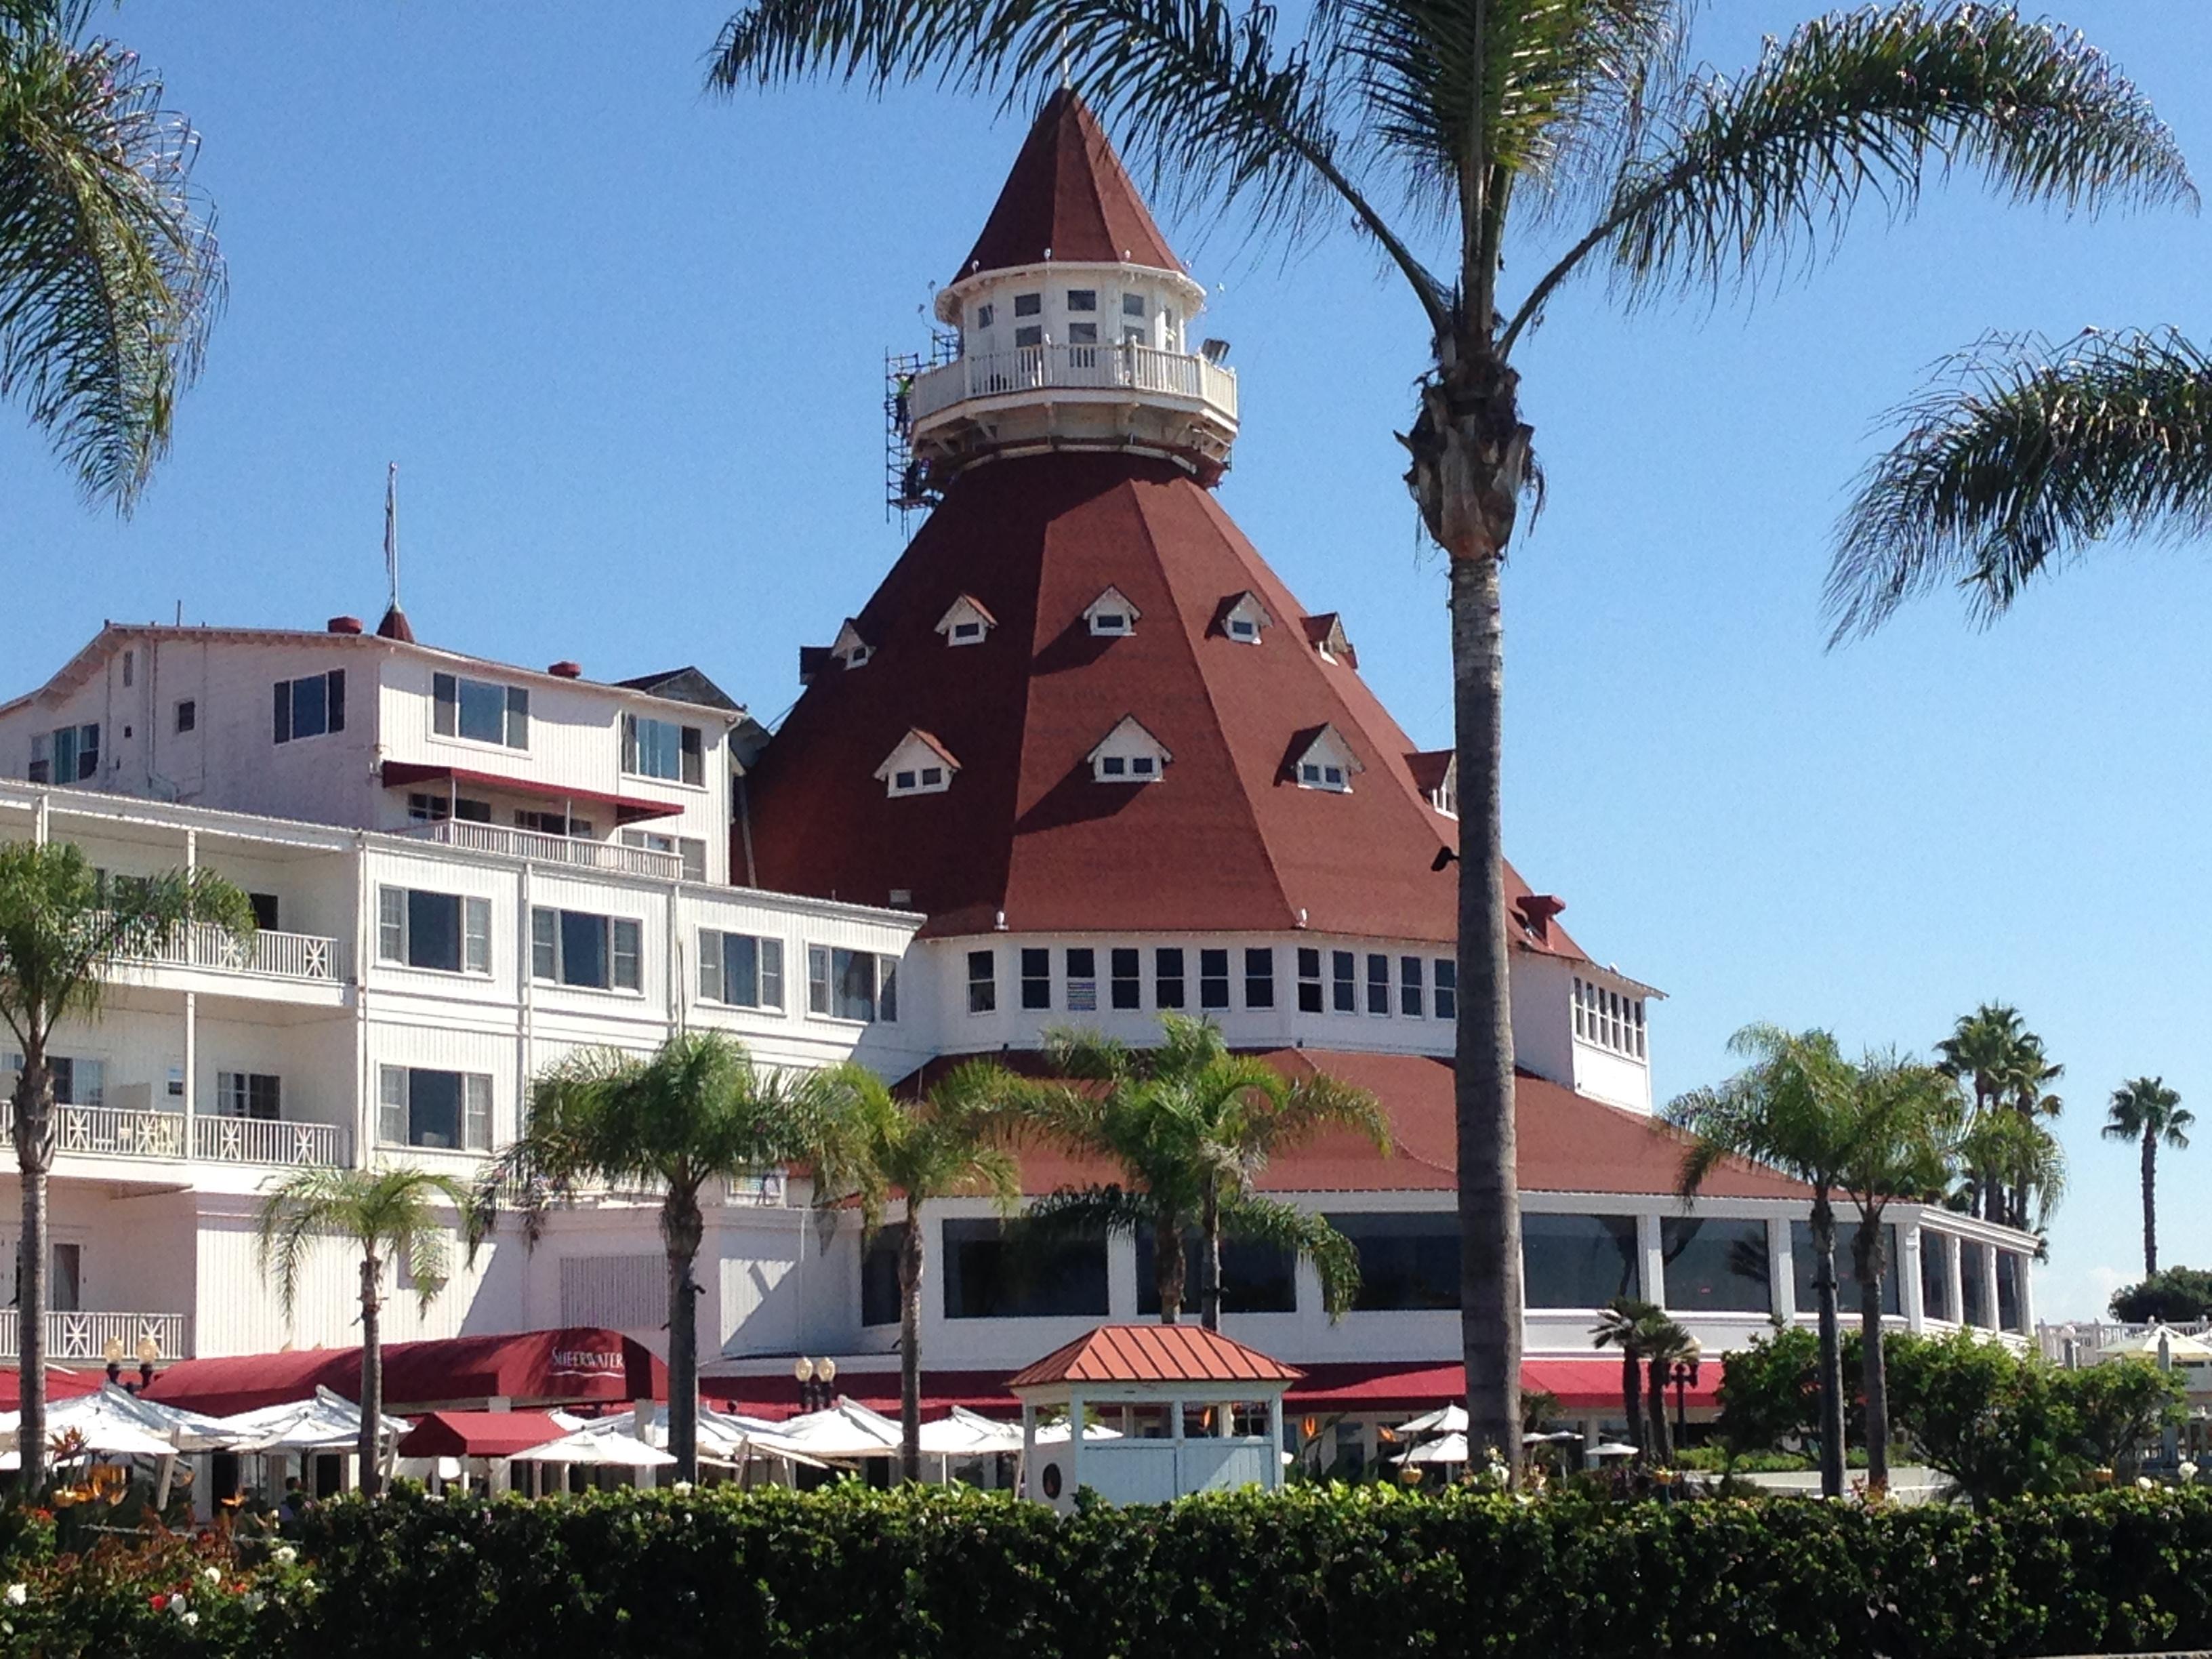 Coronado Hotel, San Diego